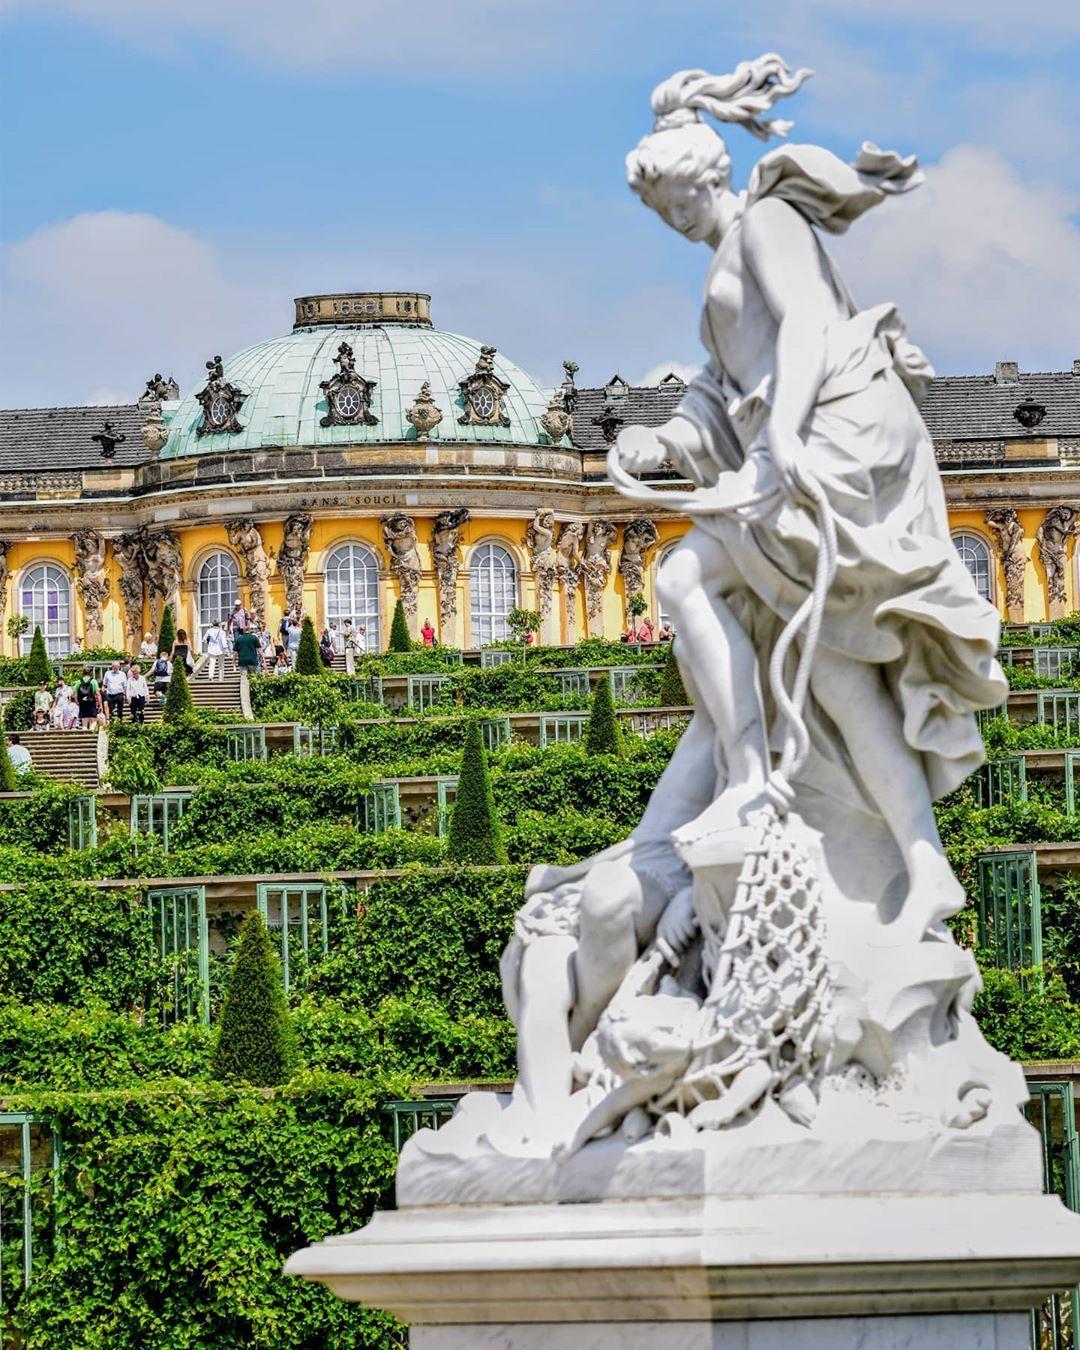 Schloss Sanssouci Sanssouci Palace Potsdam Germany In 2020 Sightseeing Germany Travel Travel